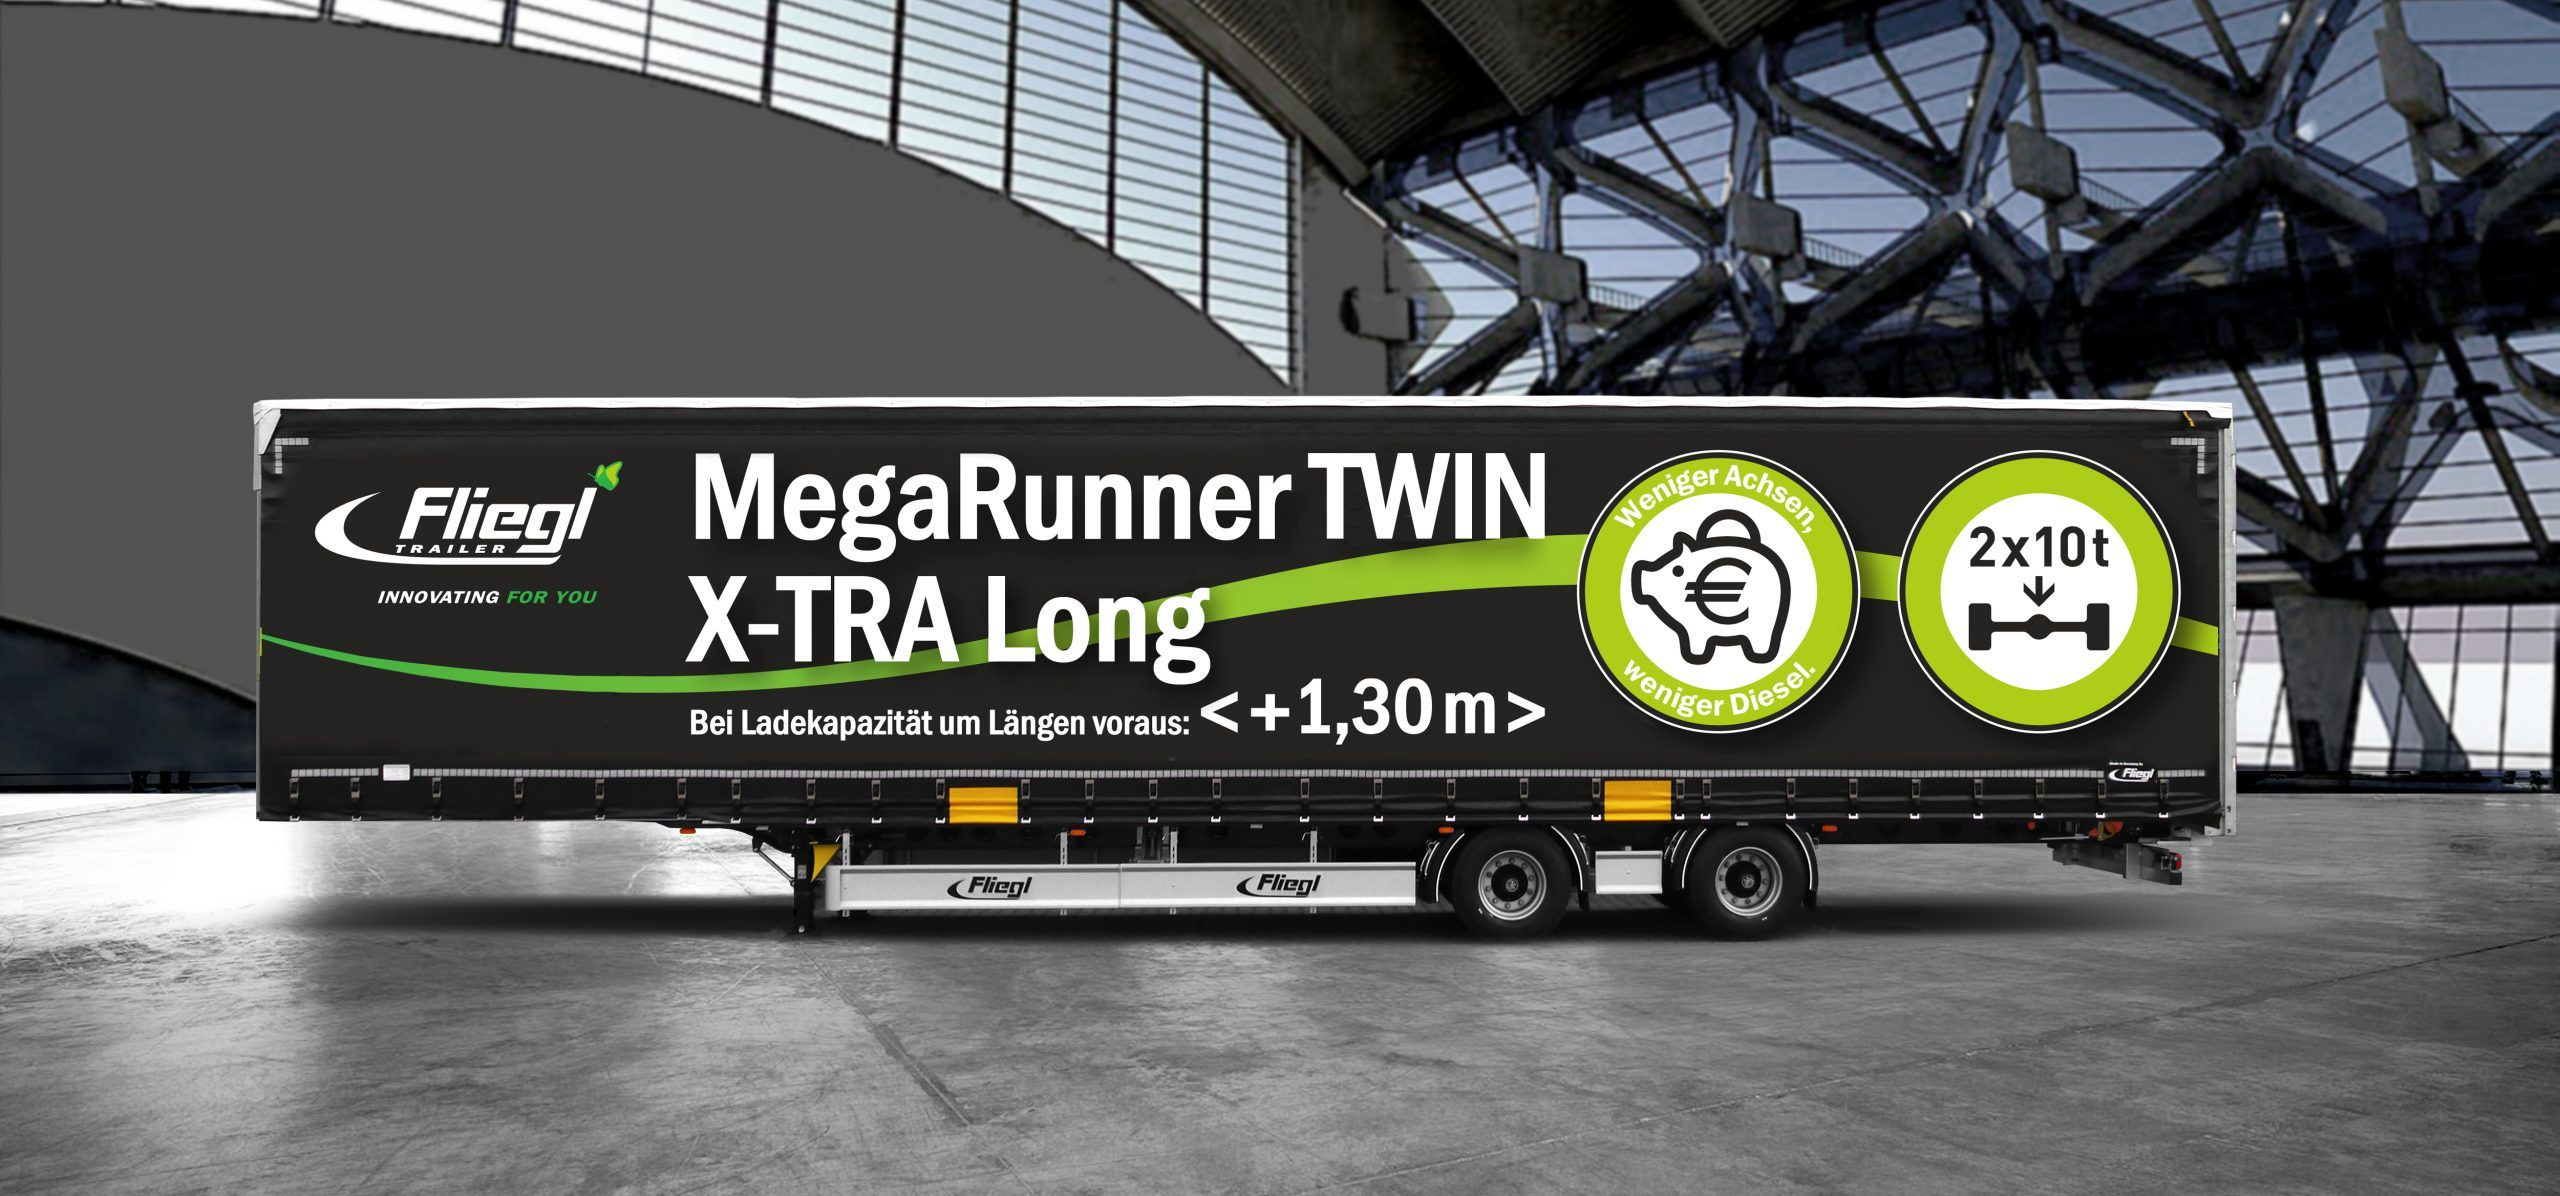 MegaRunner-TWIN-XTRA-long-1-scaled.jpg